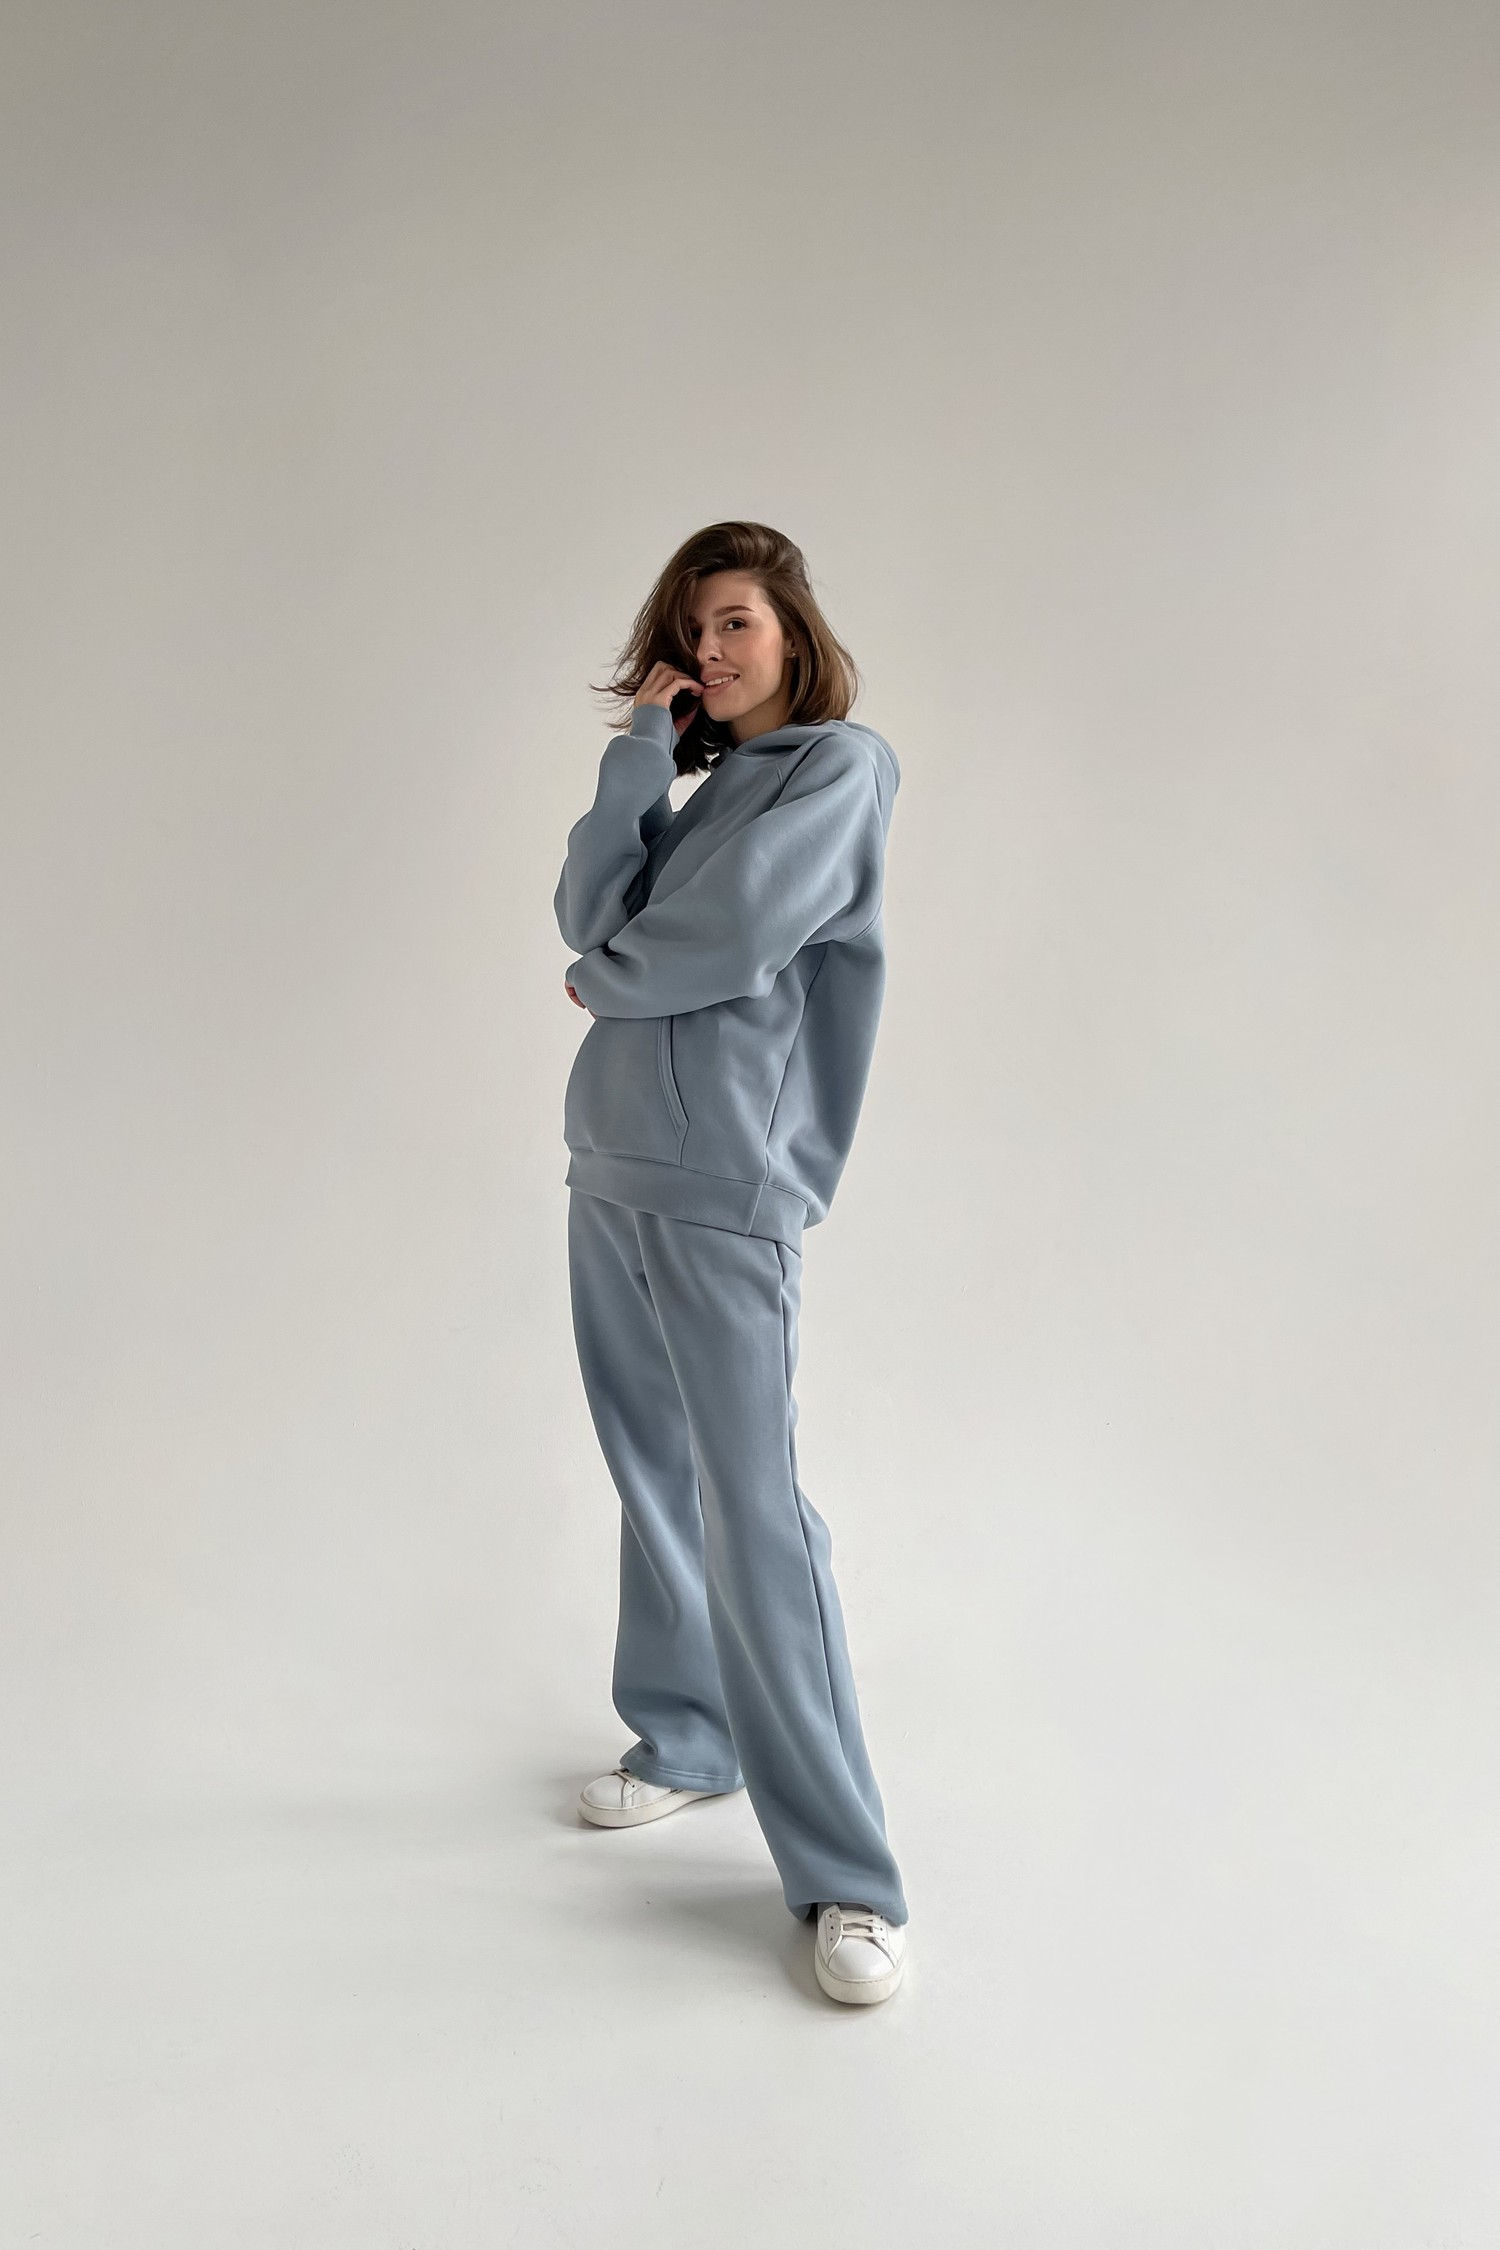 Костюм с брюками прямого кроя и худи arctic - THE LACE